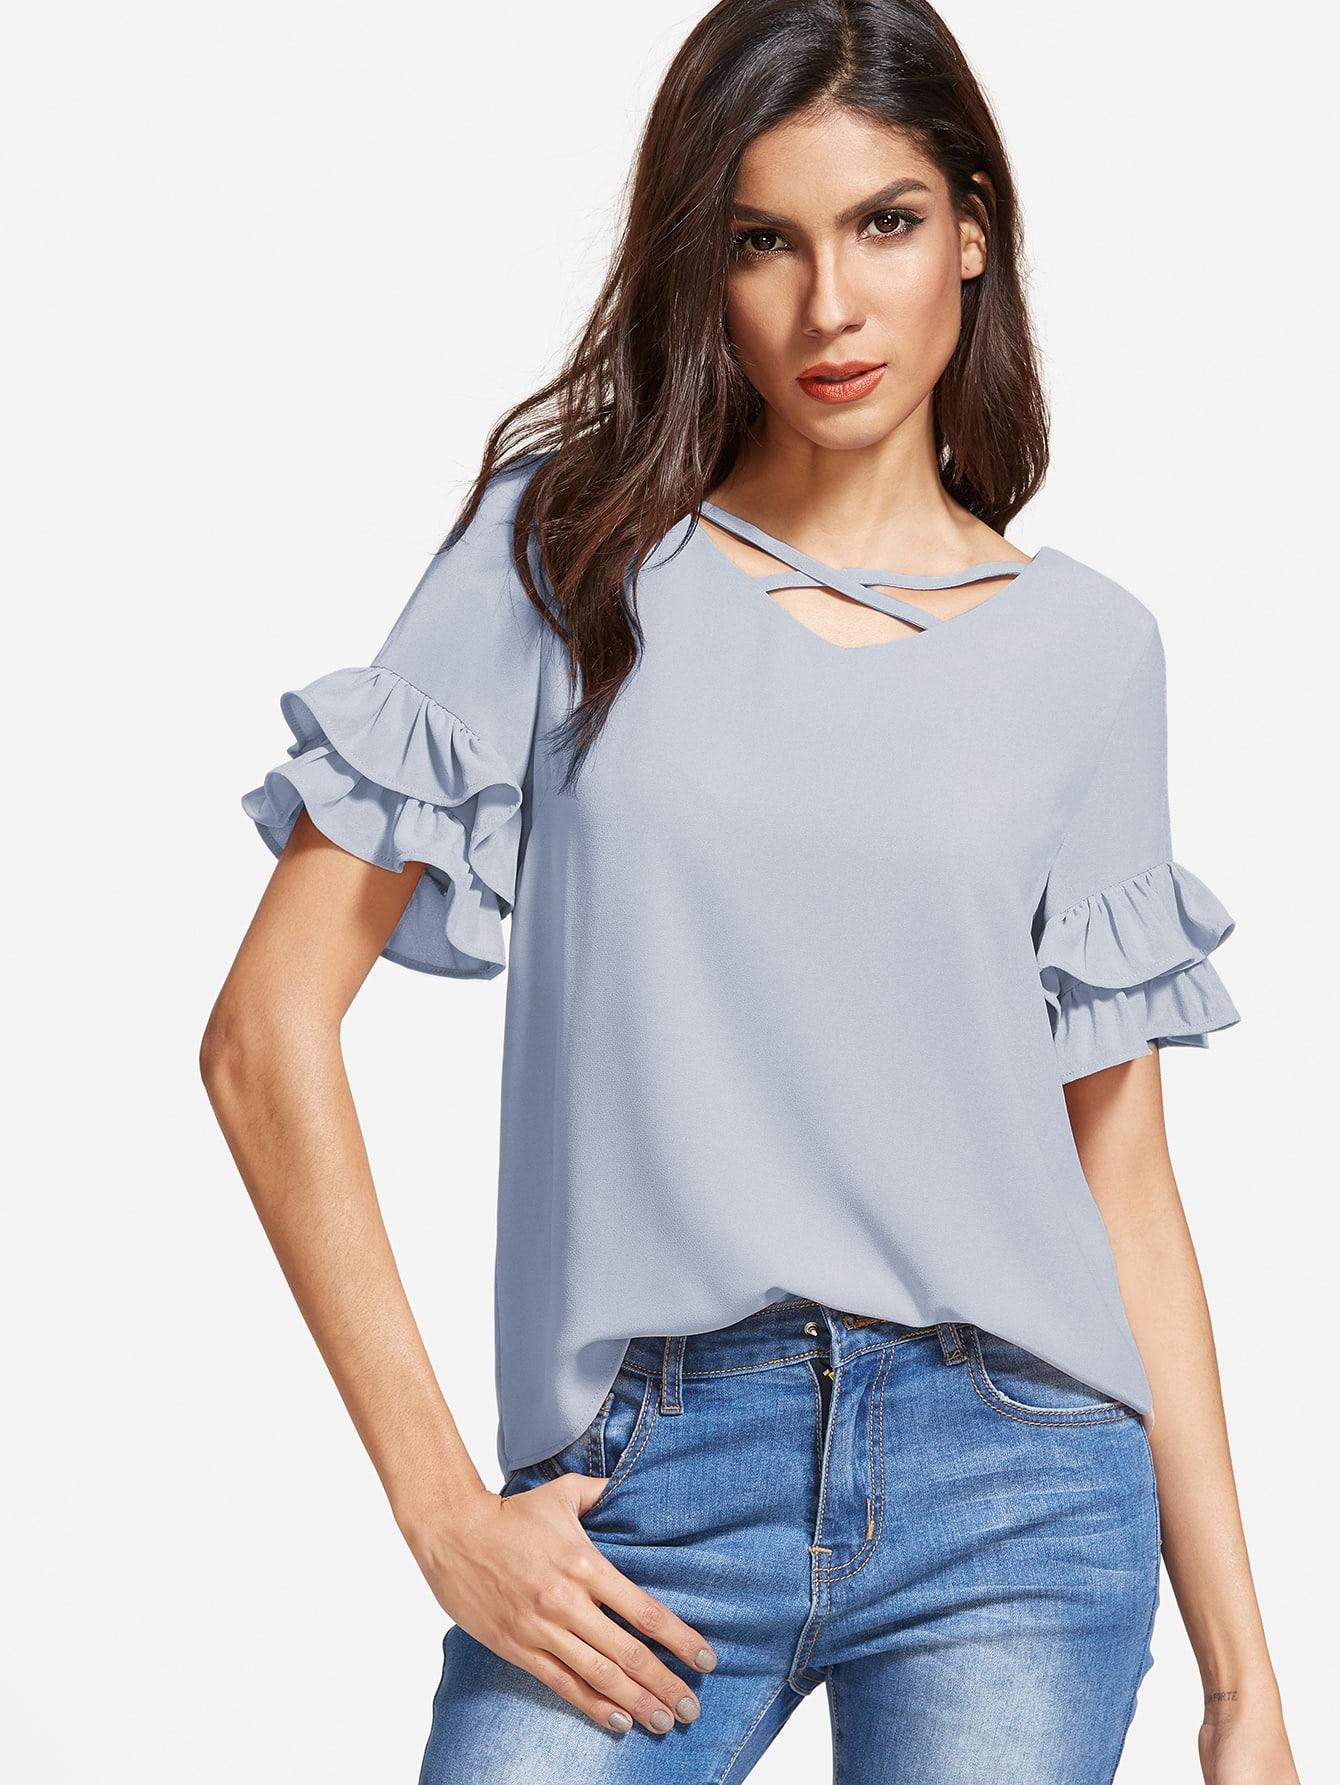 blouse170321459_2